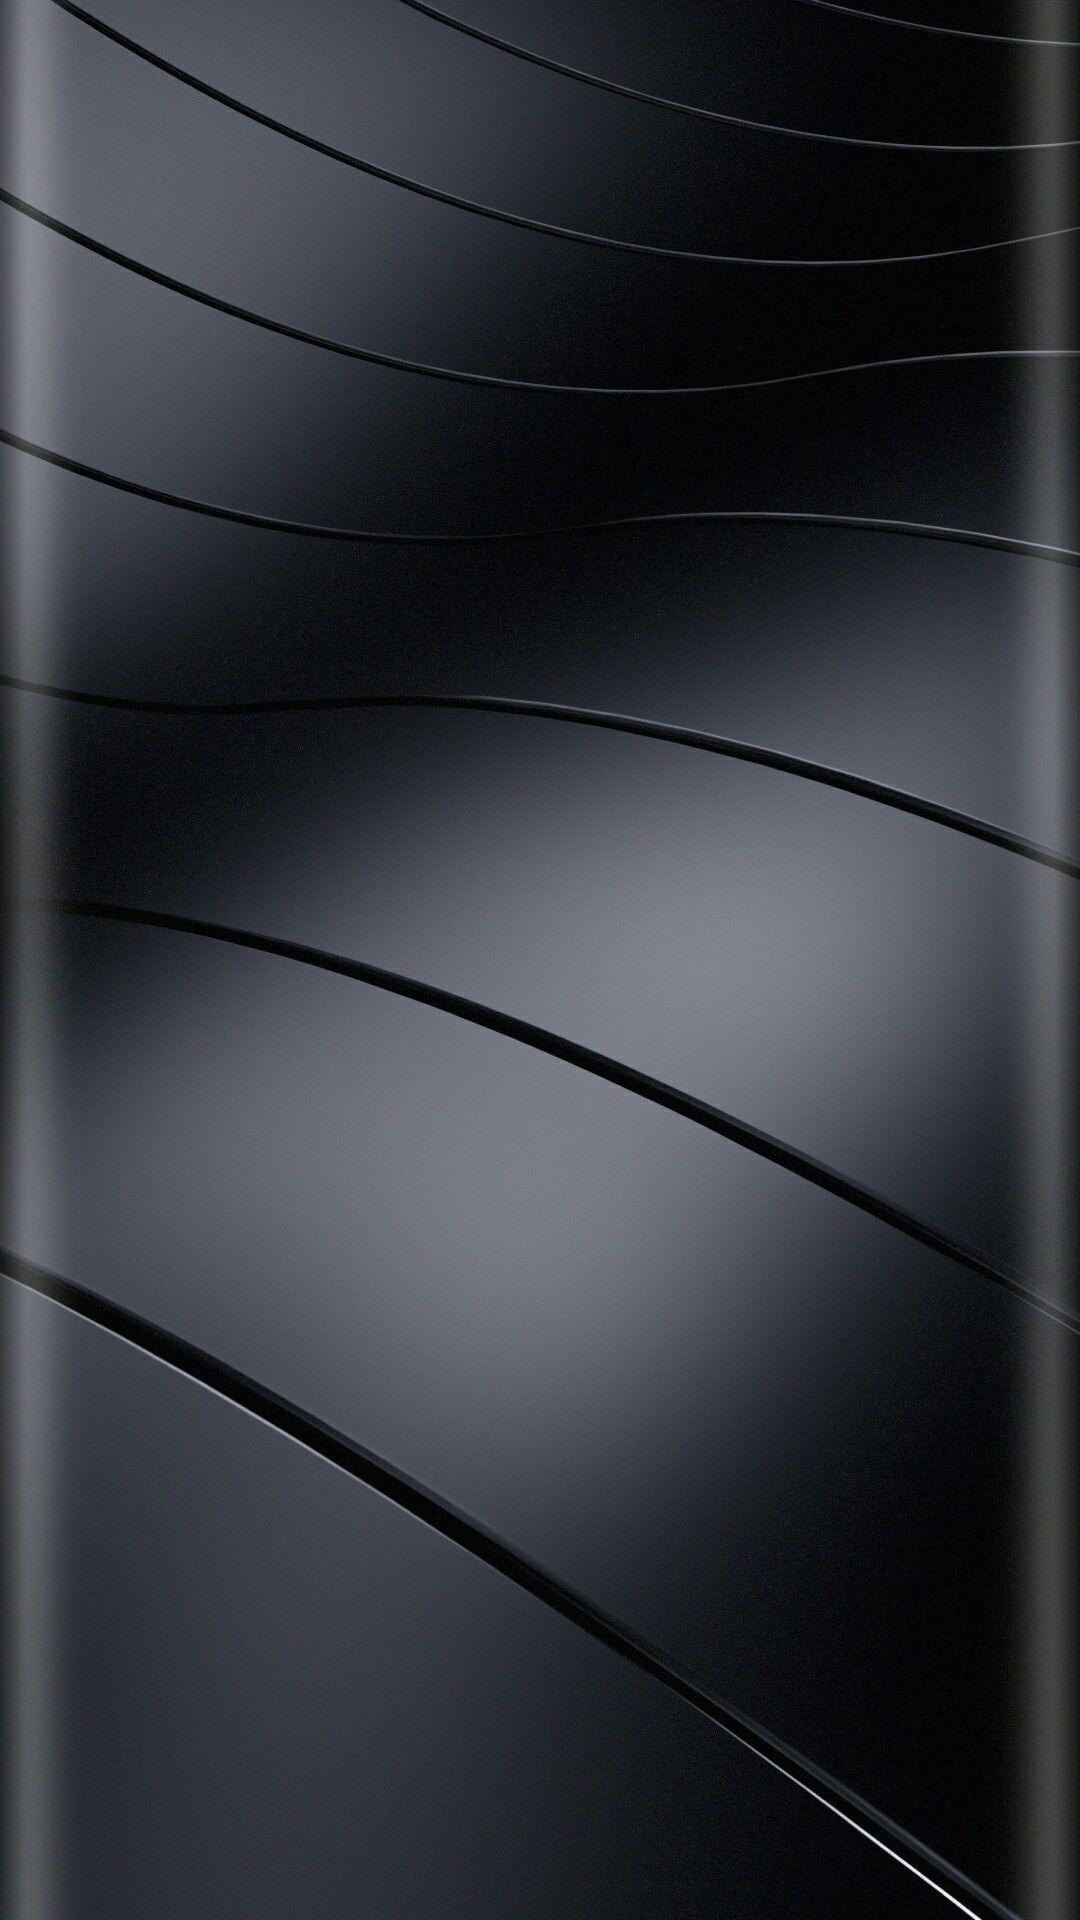 Pin by Wurth_It on wallpaper edge Black wallpaper